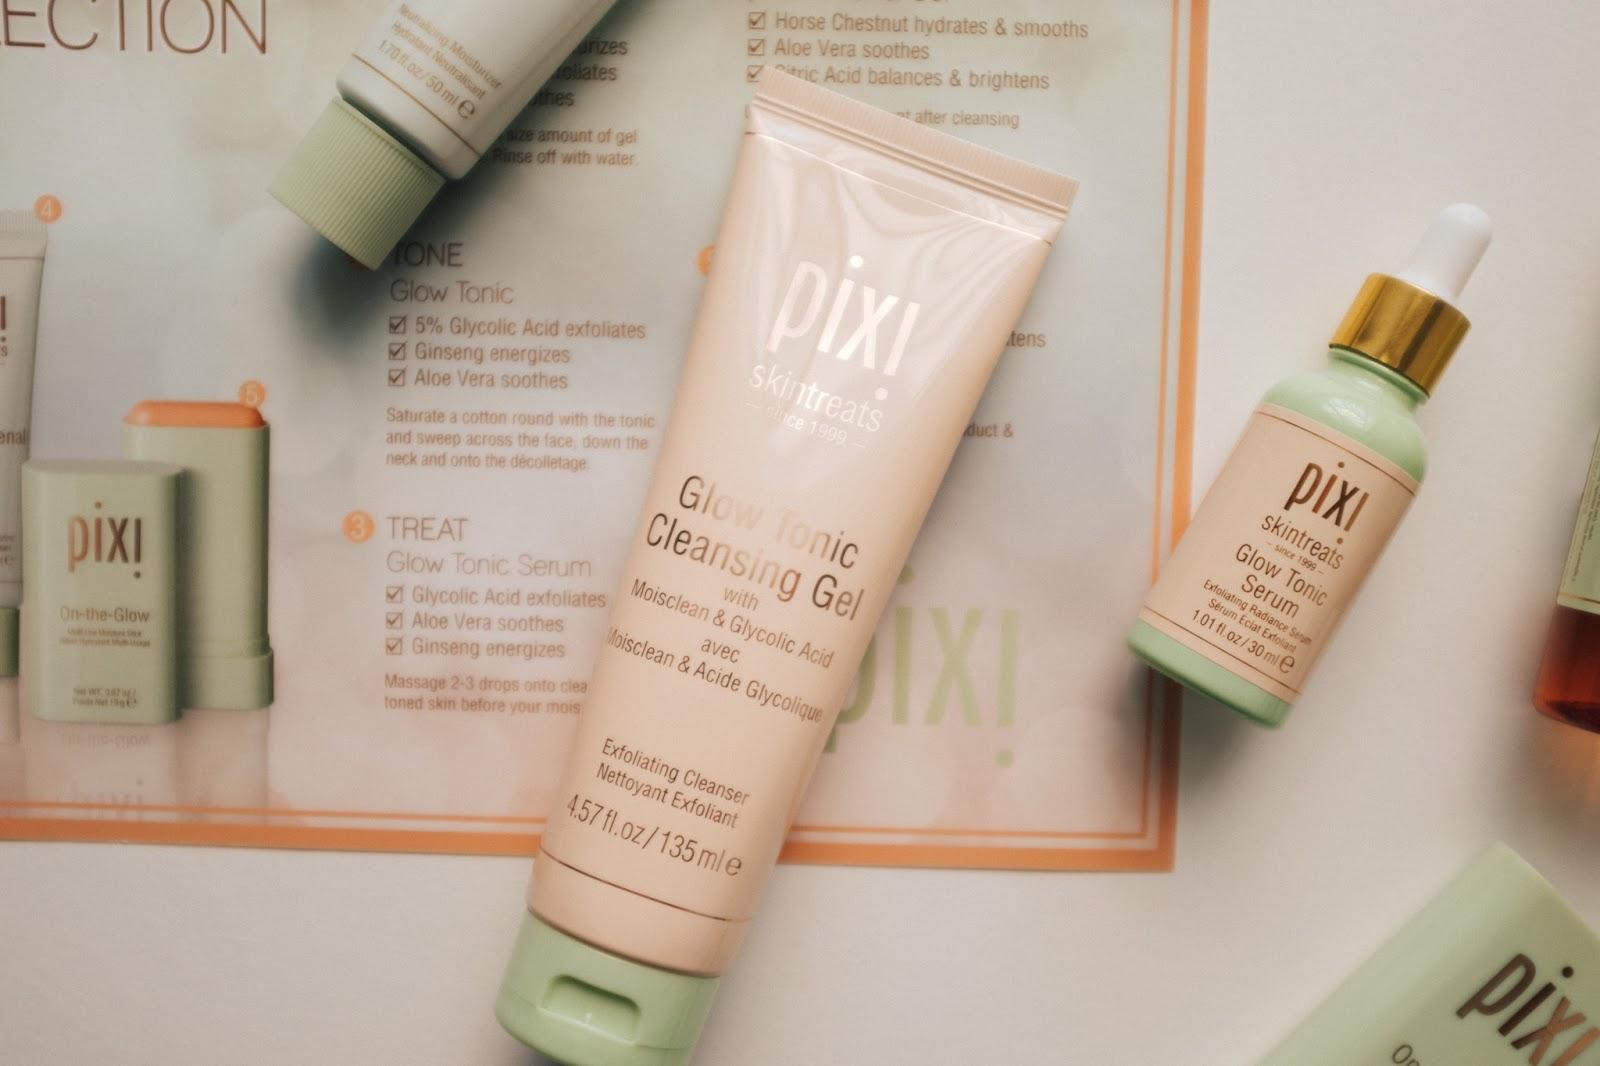 Pixi Glow Tonic Cleanser